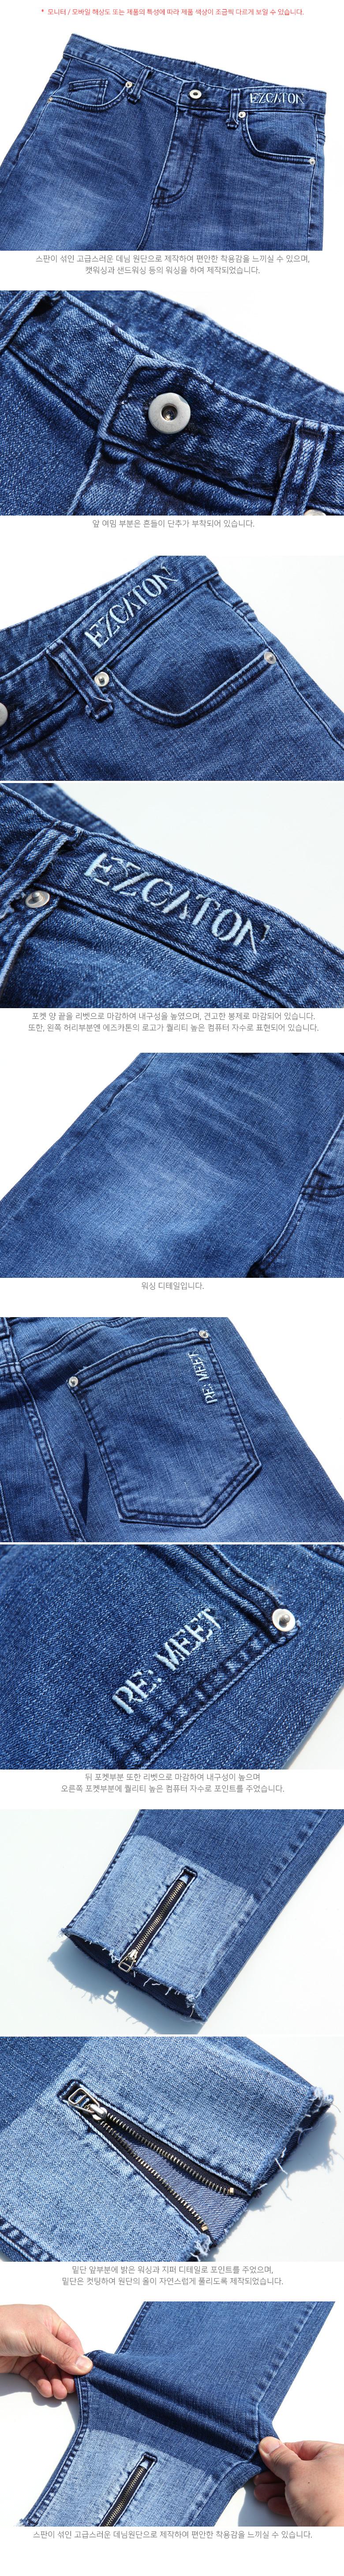 20190319_ez_ventcrop_detail_blue_ym_02.jpg